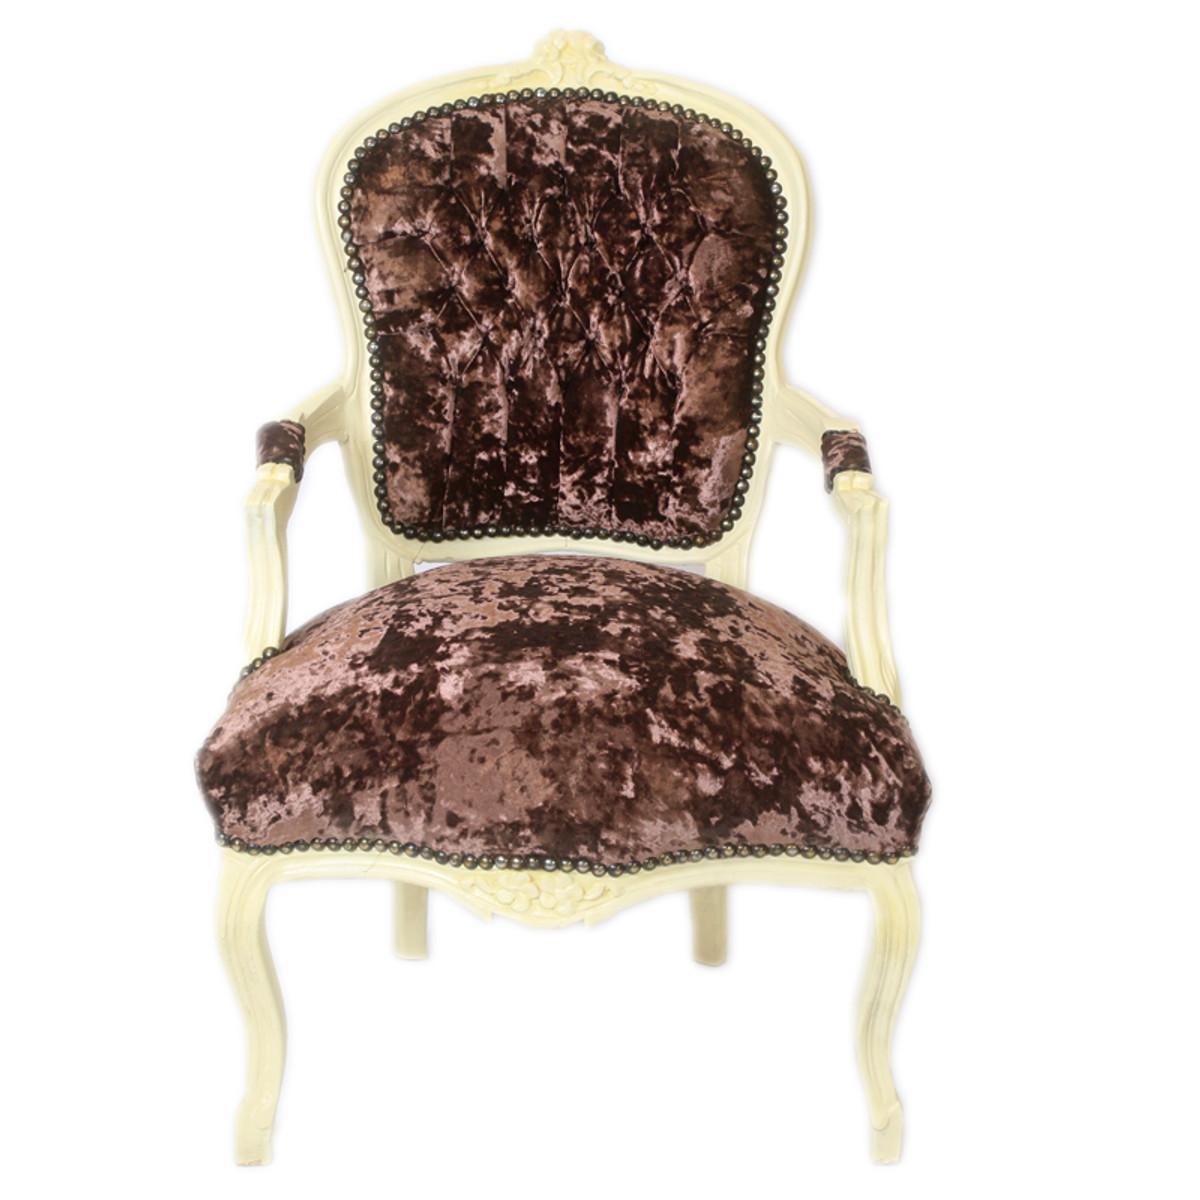 Casa padrino barock salon stuhl braun velour stoff creme antik design m bel st hle barock - Stoel dineren baroque ...